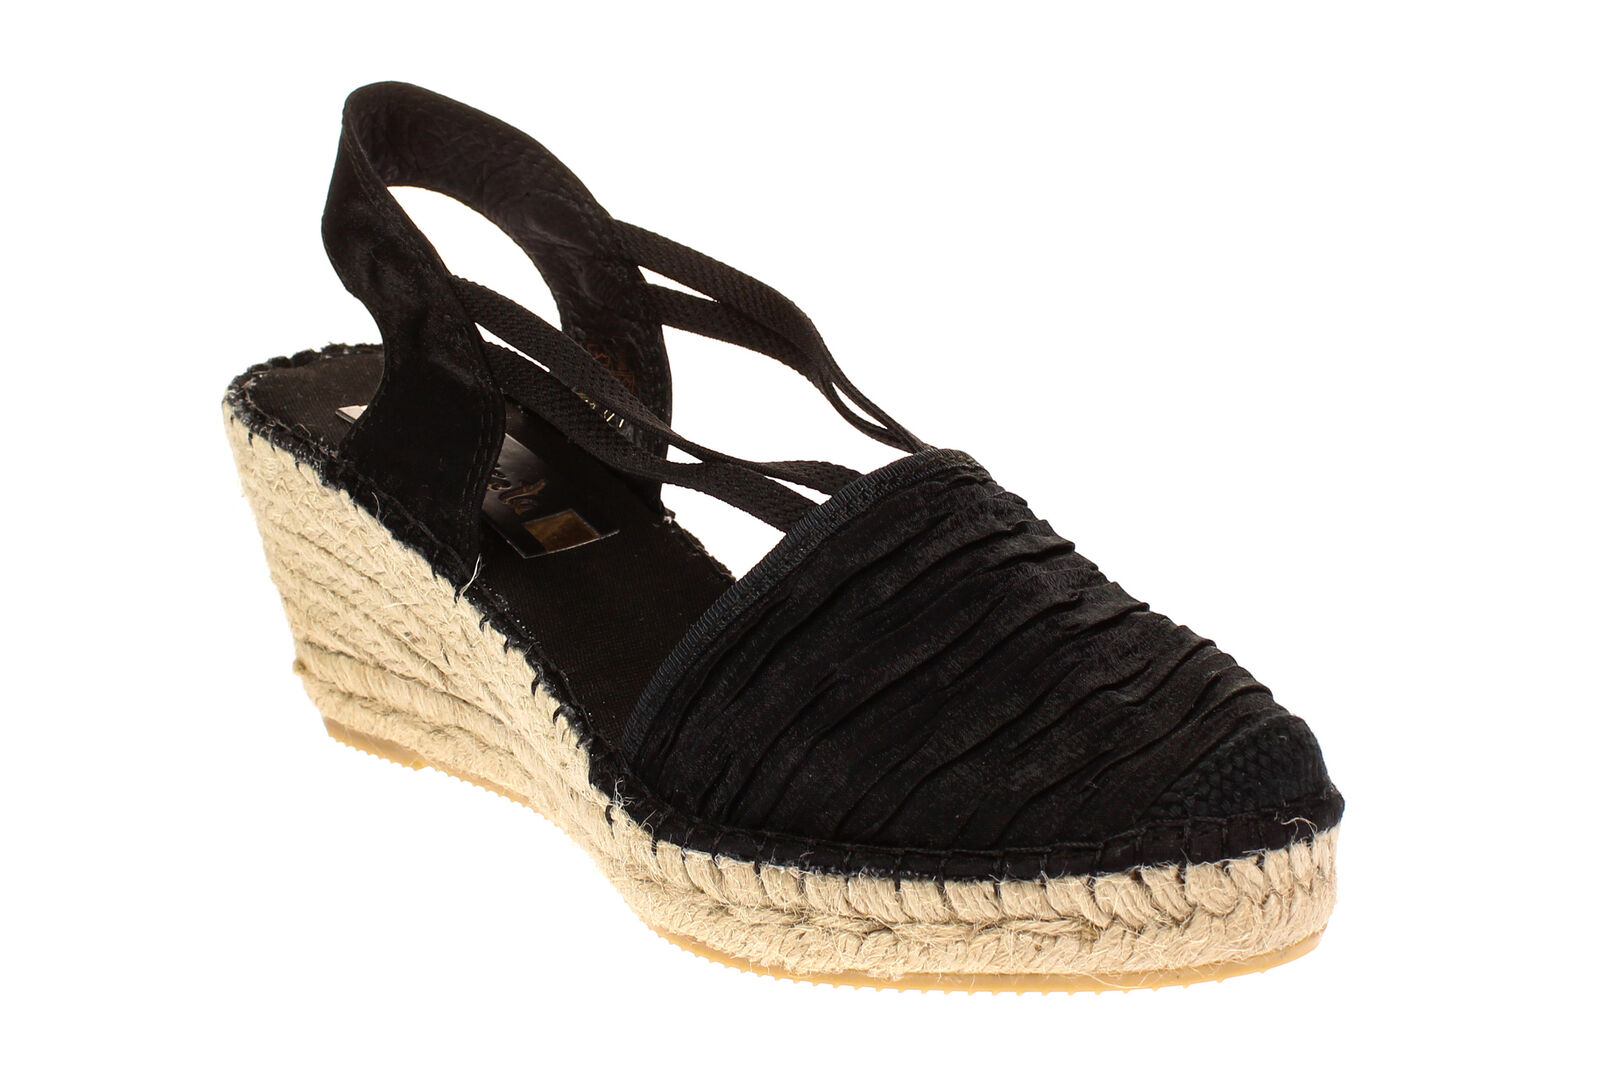 Vidoretta 18400-SEÑORA zapatos sandalias de cuña zapatos casual-estrella negra